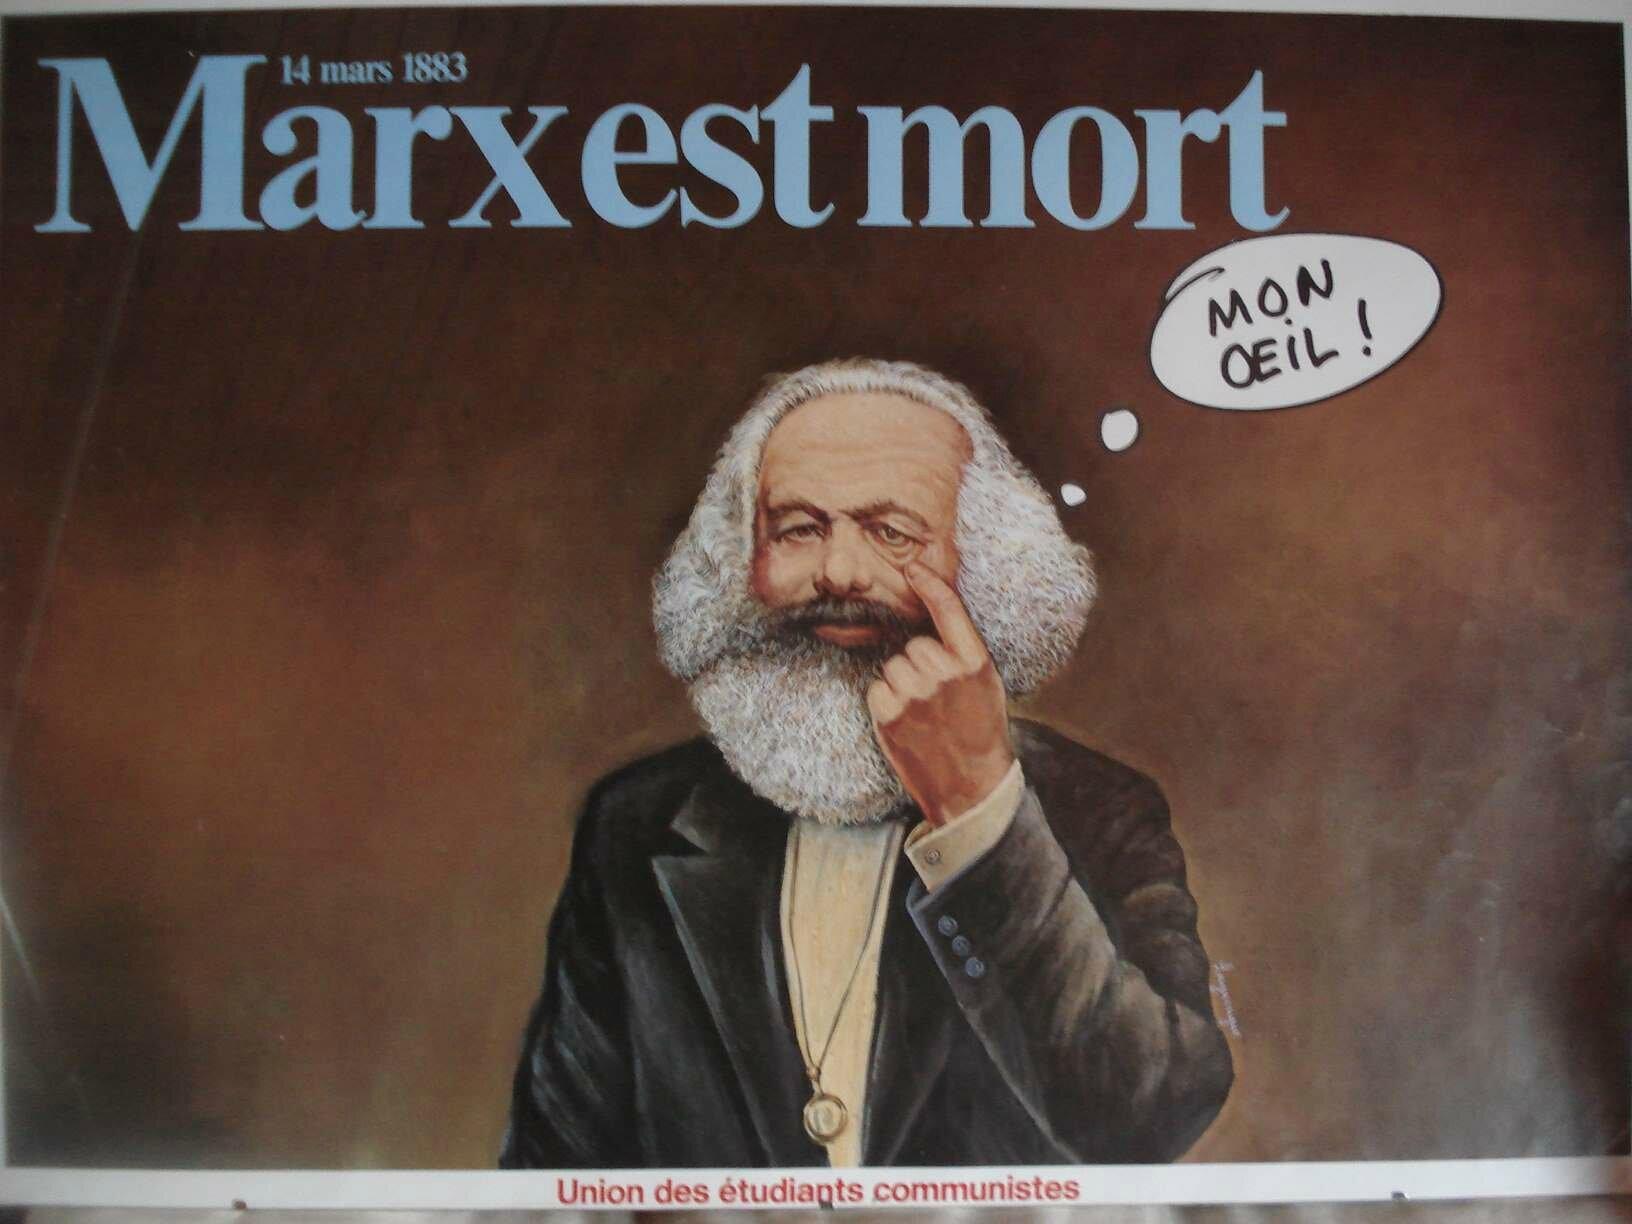 KARL MARX (1818 - 1883) - MARX EST MORT ? MON OEIL !